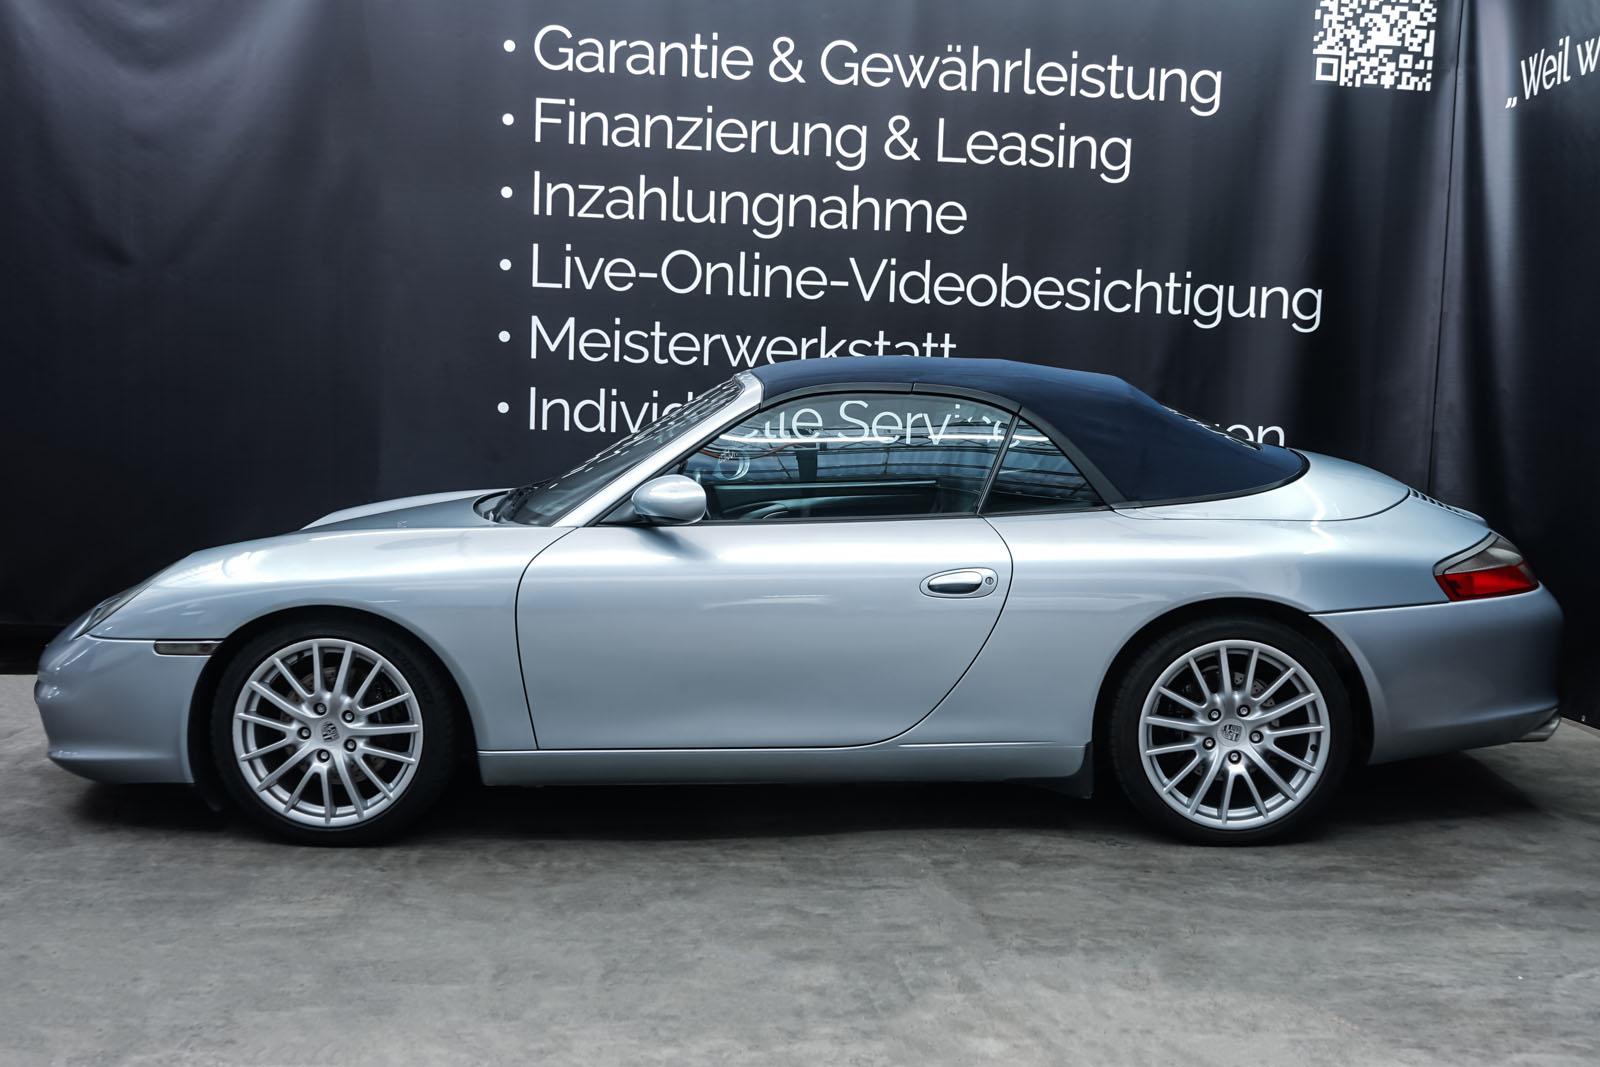 Porsche_996_Cabrio_Silber_Dunkelblau_POR-1724_5_w